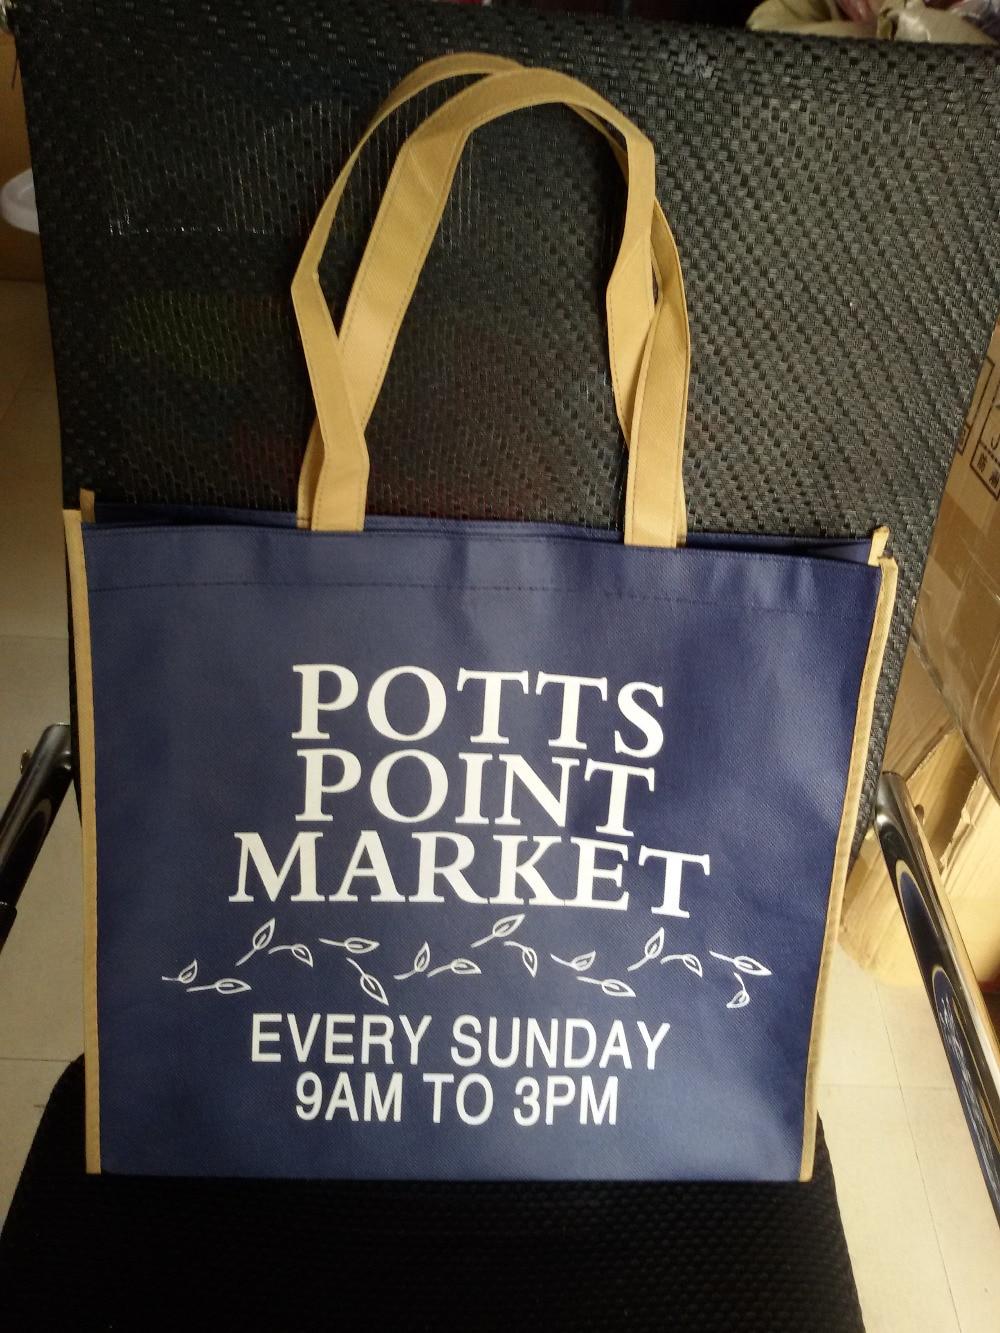 wholesales 1000pcs lot 35Hx40x10cm custom printed logo non woven reusable package gift shopping bags handbag eco